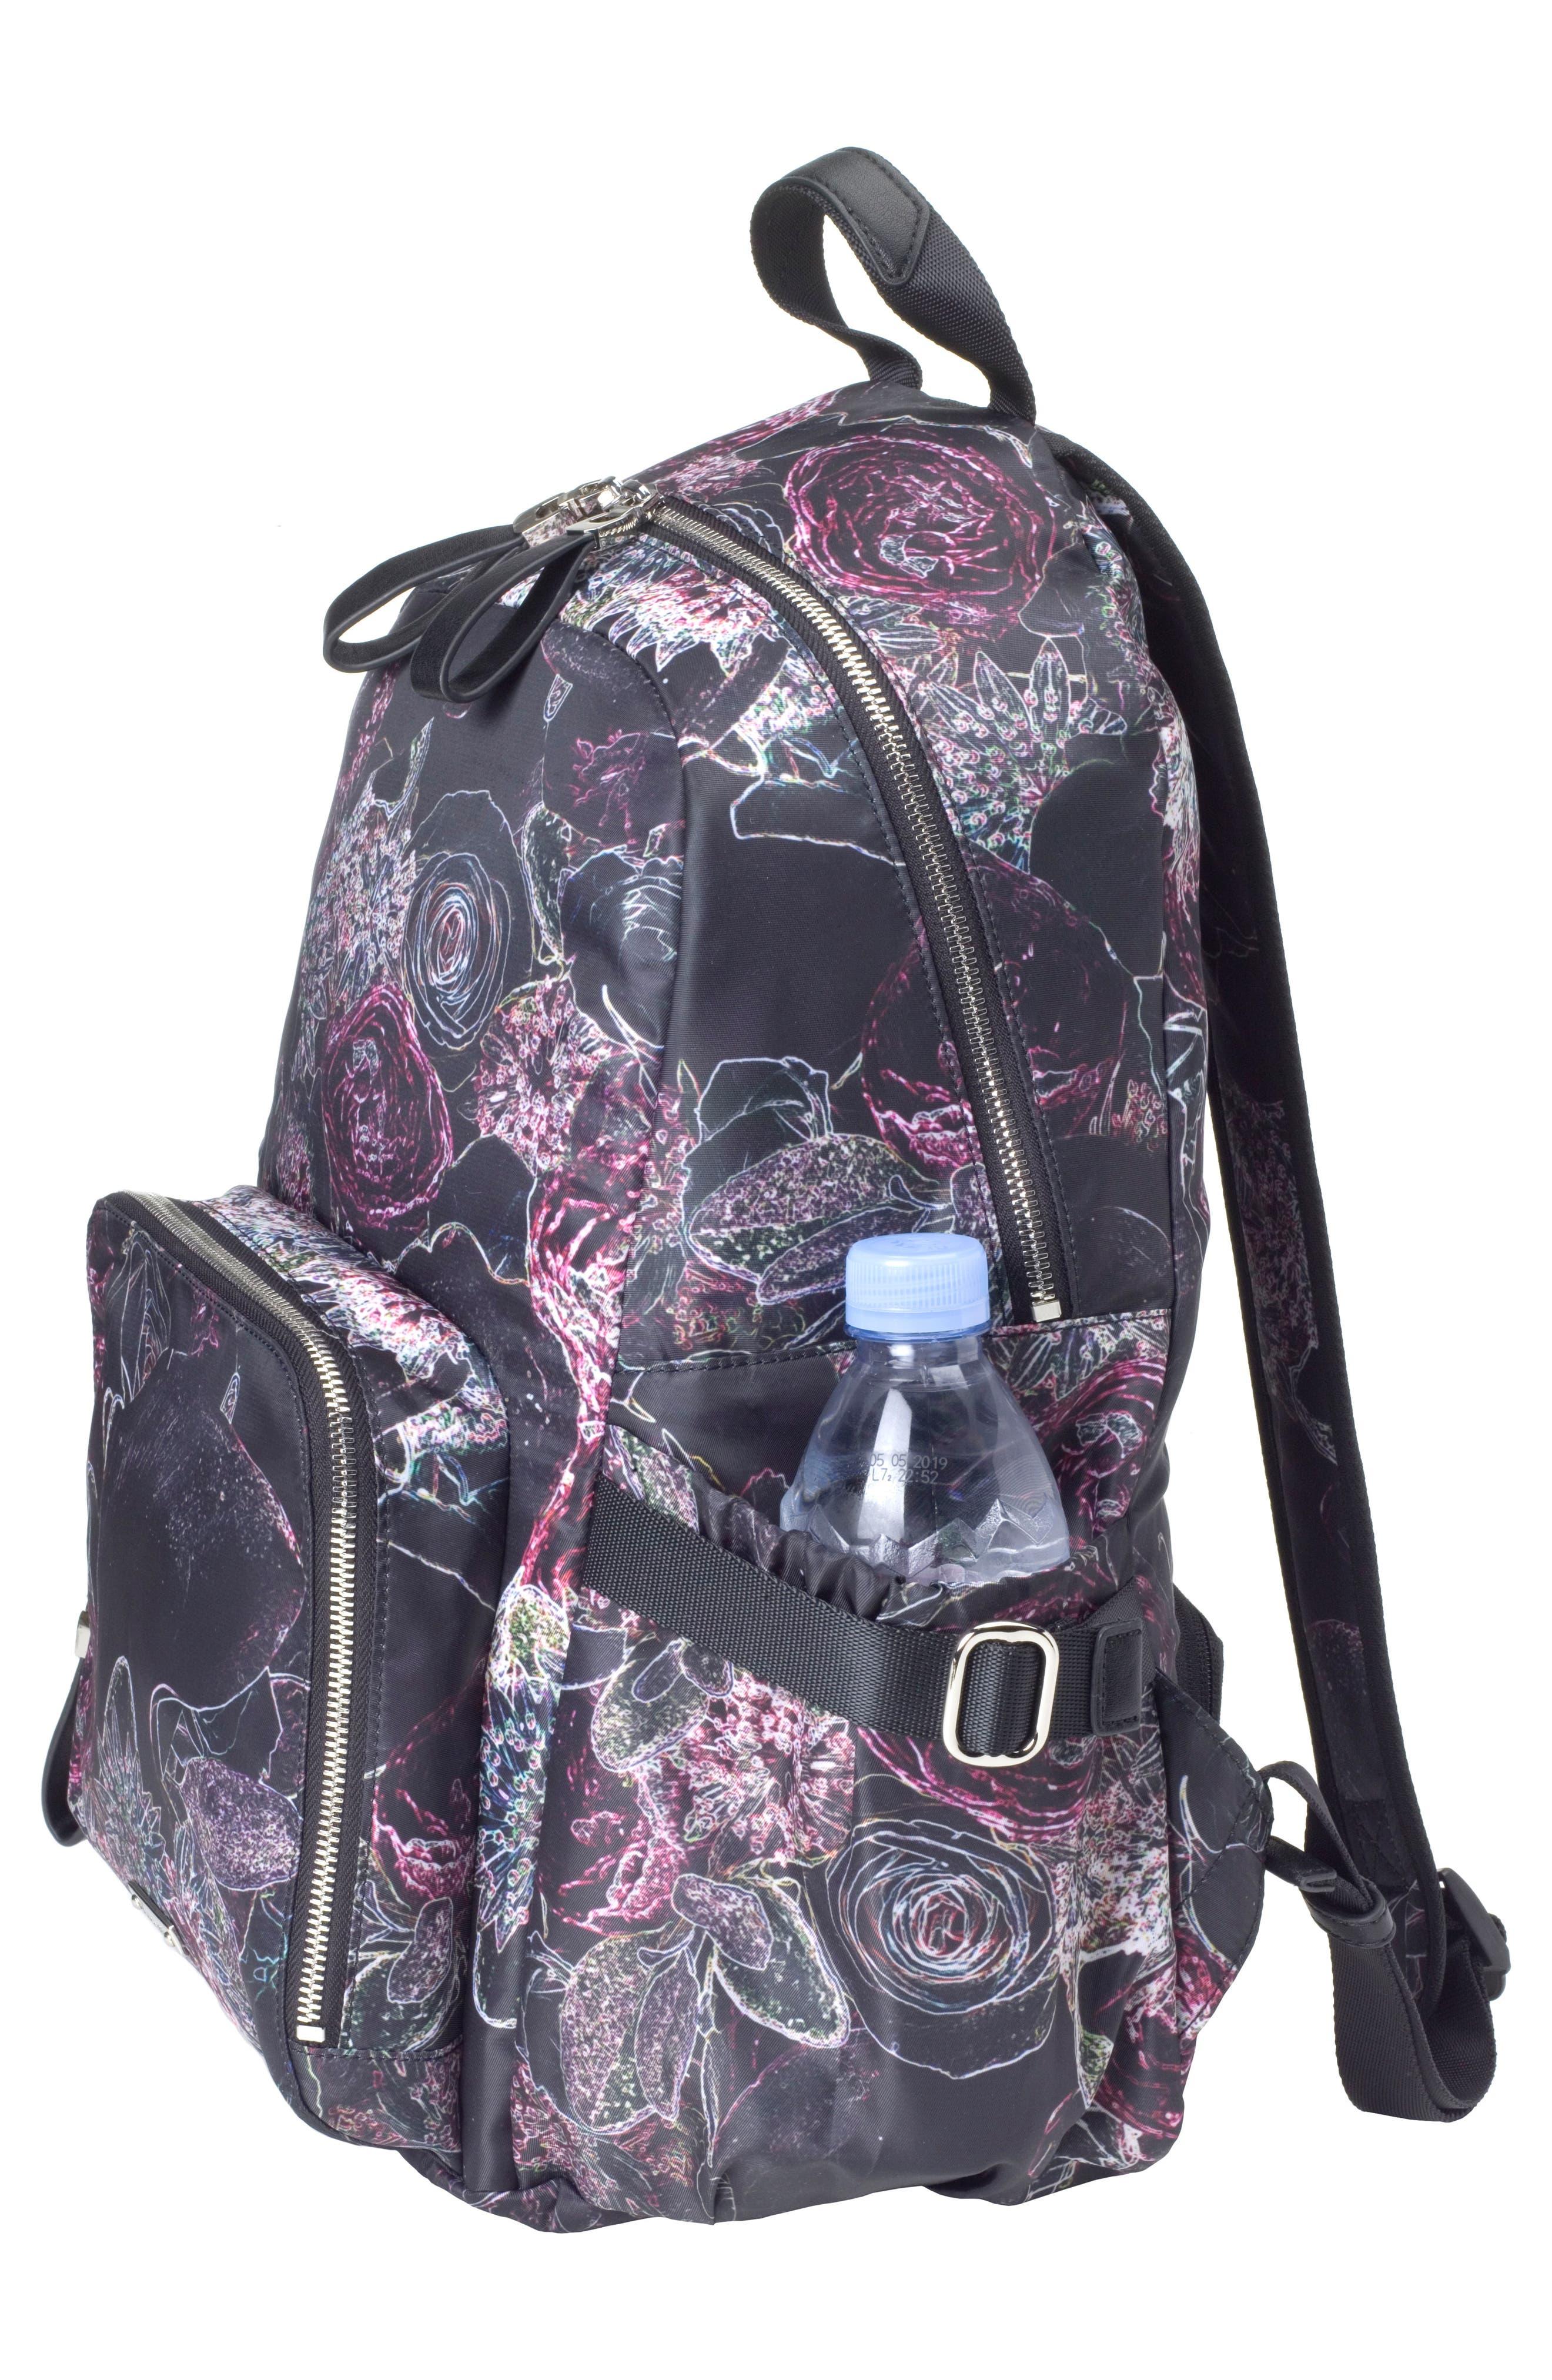 Hero Water Resistant Nylon Backpack Diaper Bag,                             Alternate thumbnail 9, color,                             Neon Floral